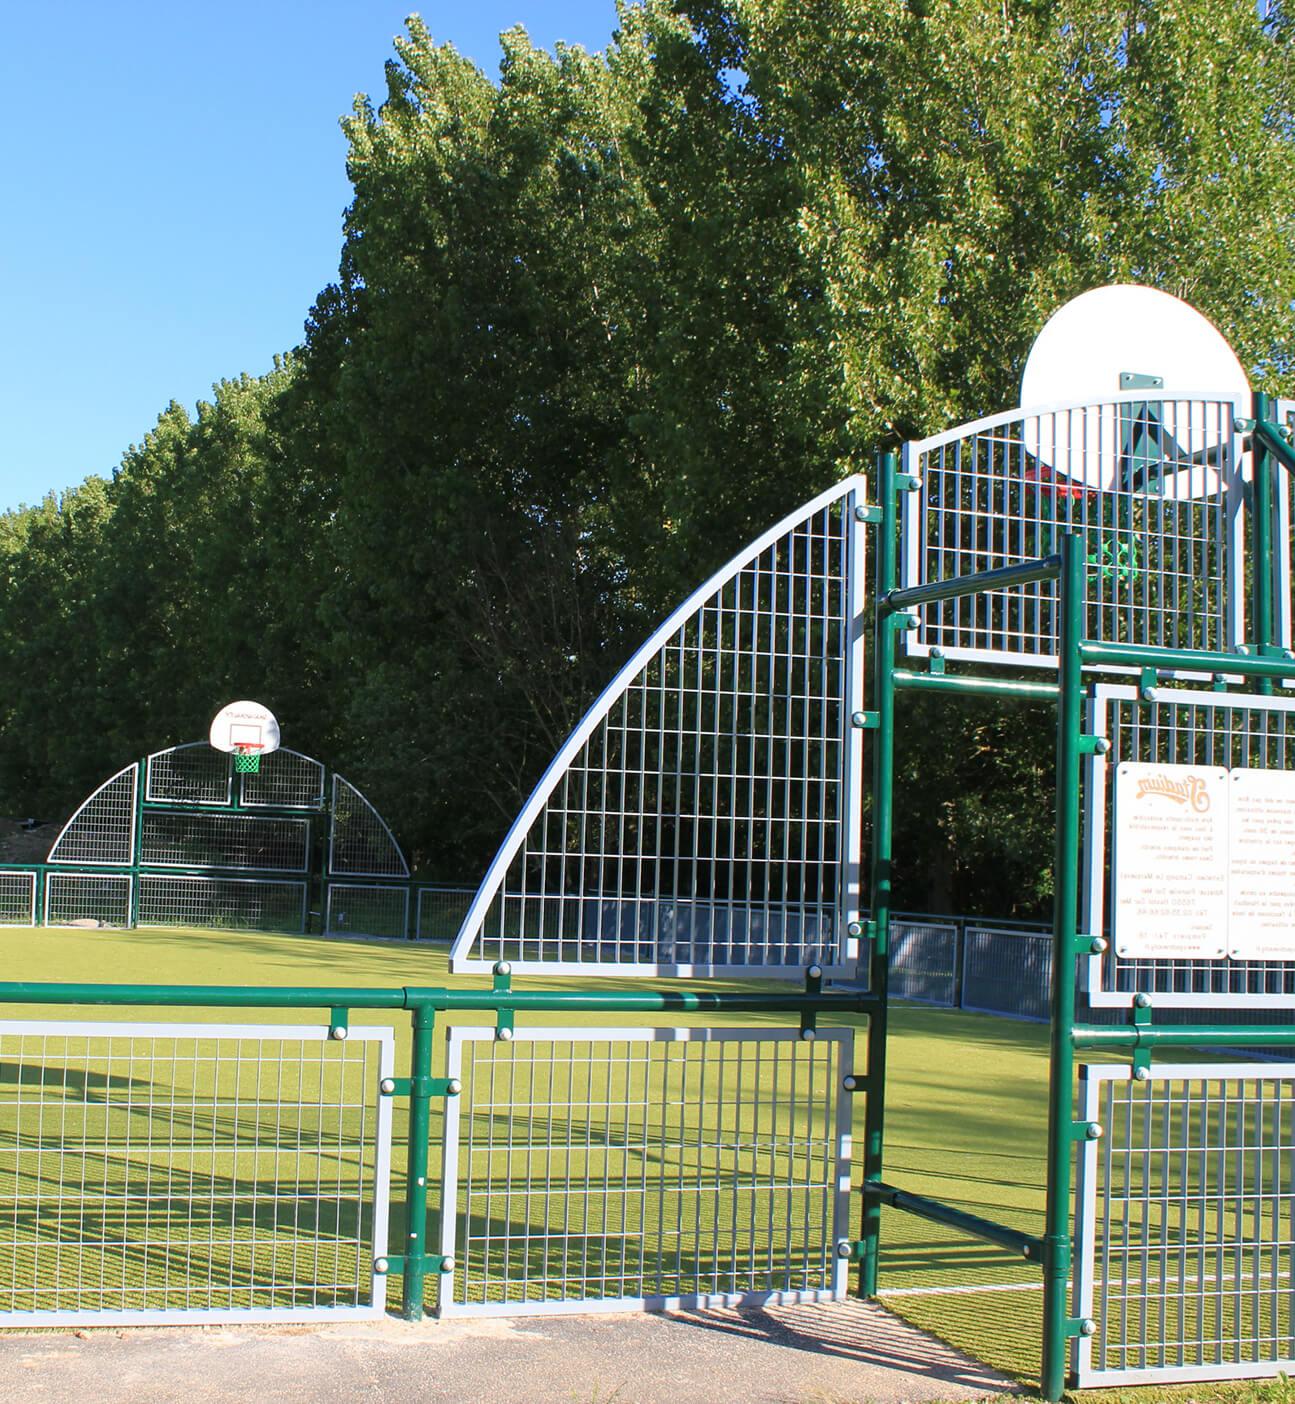 Le Marqueval 05 - Stade multisport